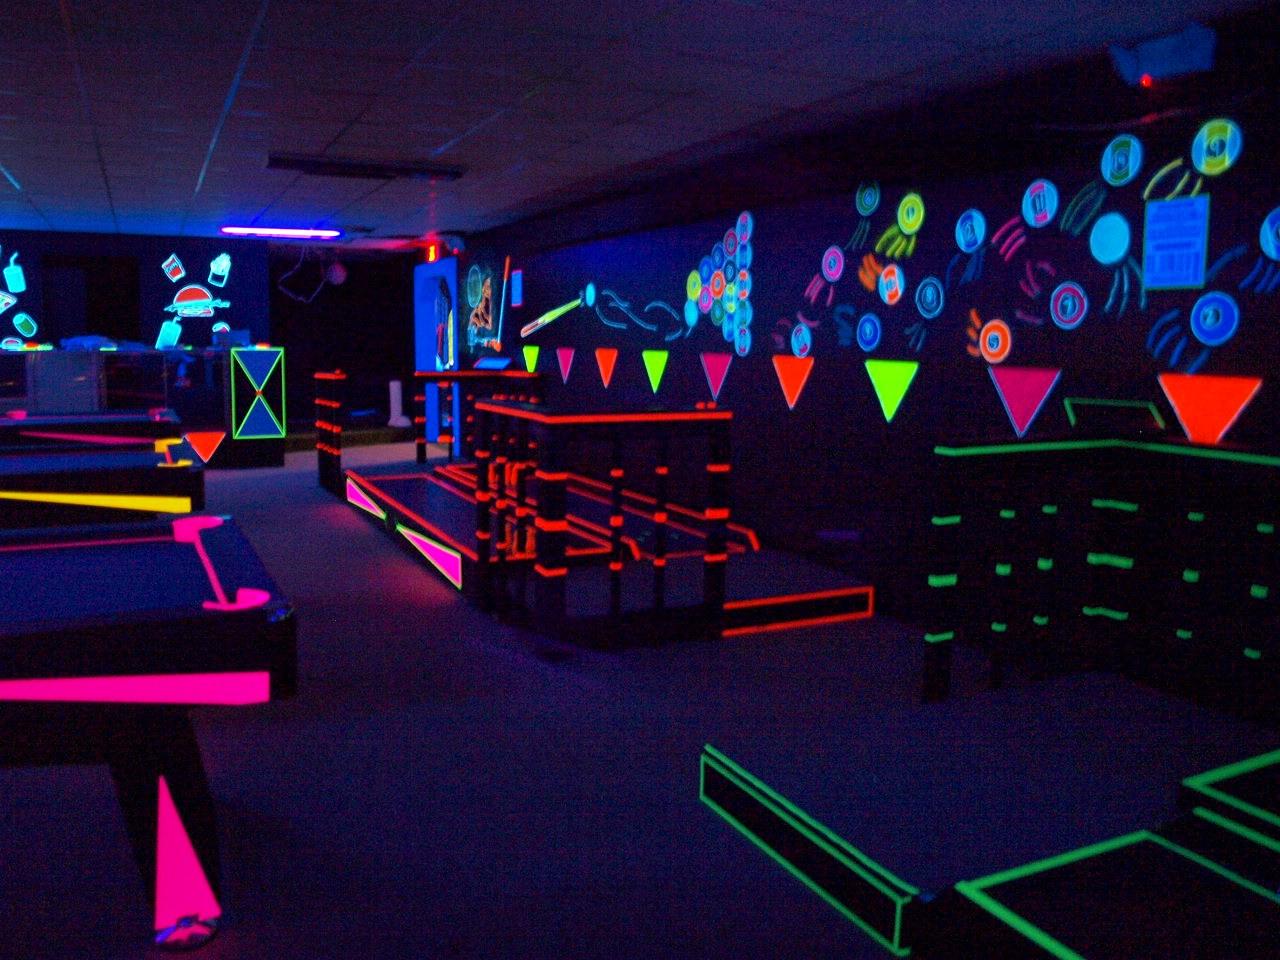 Blacklight Game Room